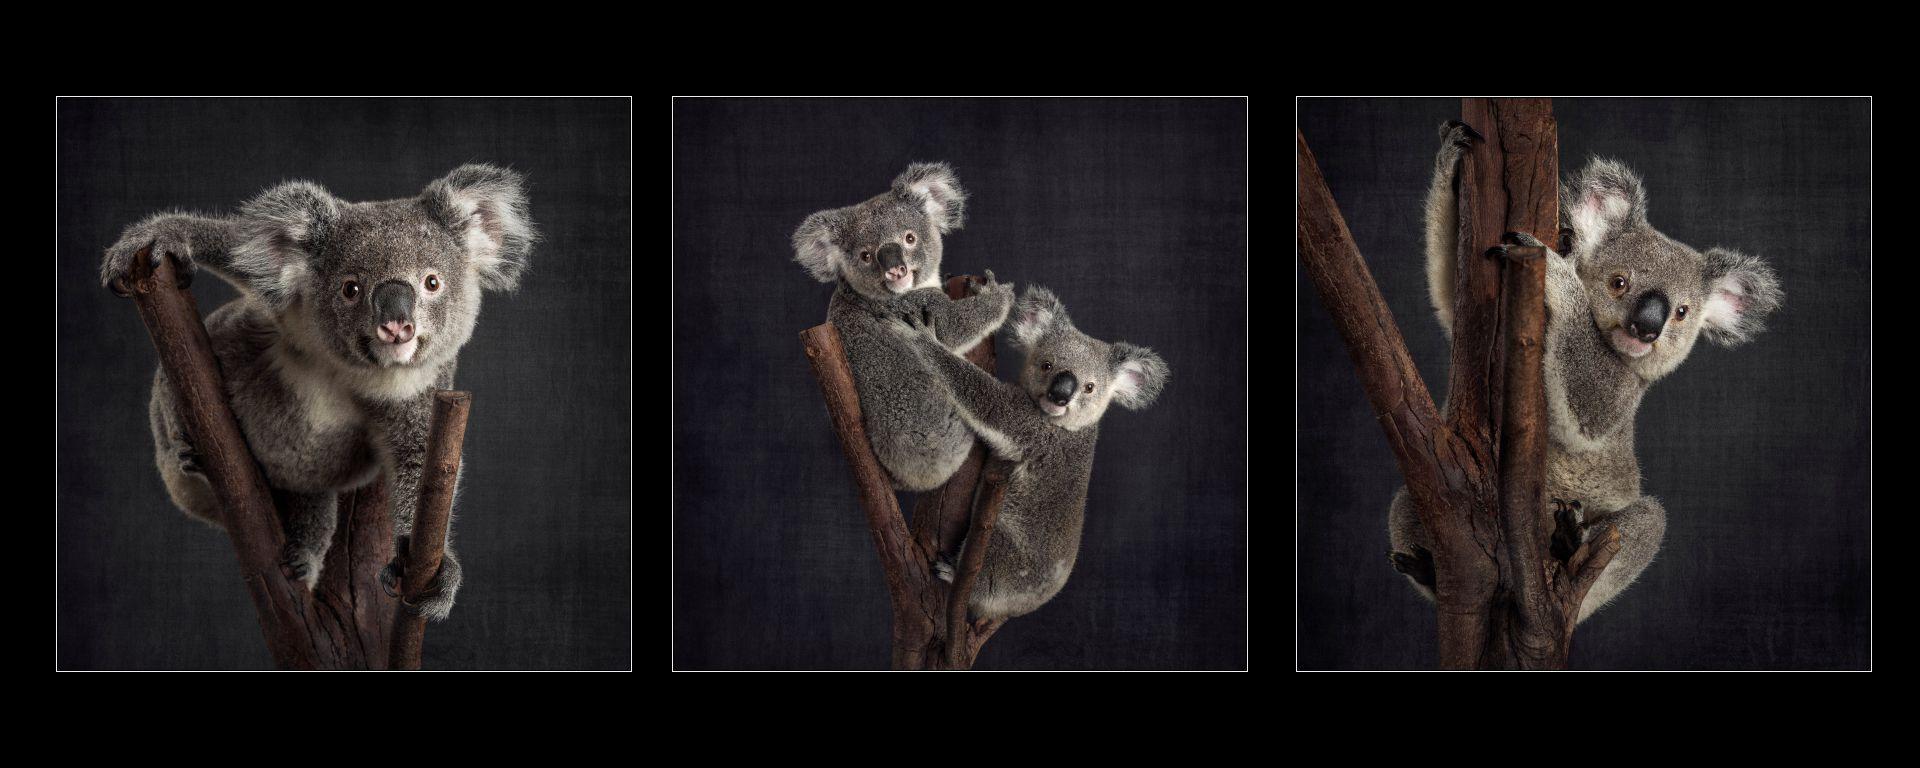 Koala-hospital-fundraiser-zoo-studio-melbourne-pet-photography